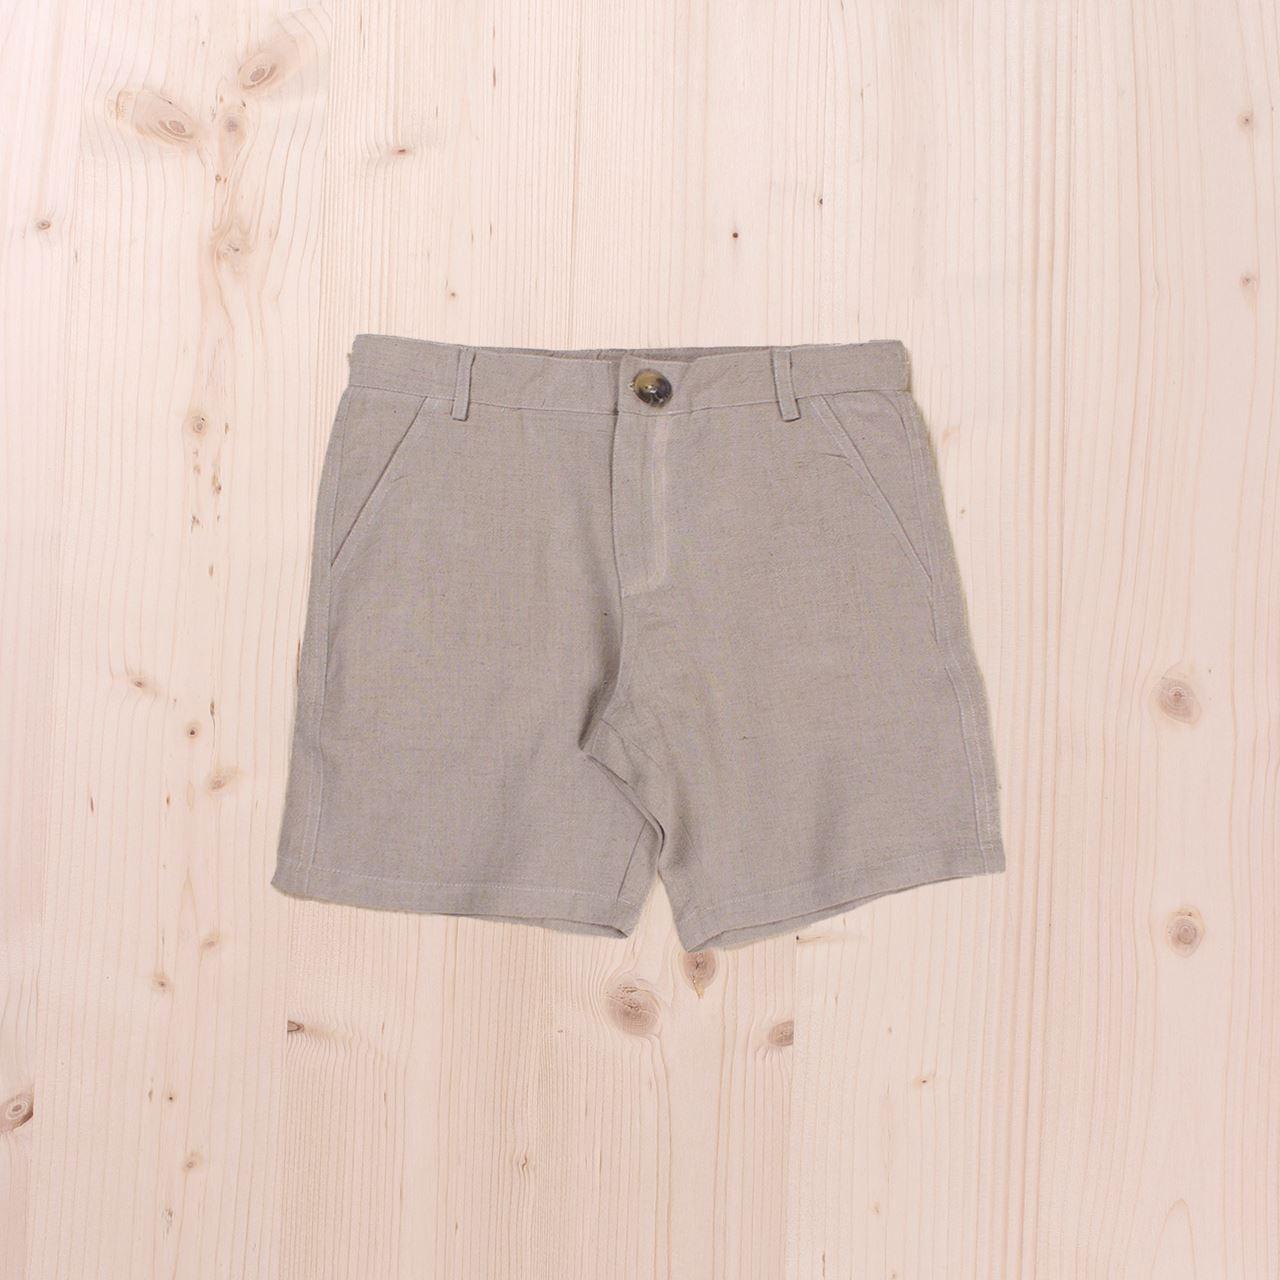 Imagen de Pantalón corto niño